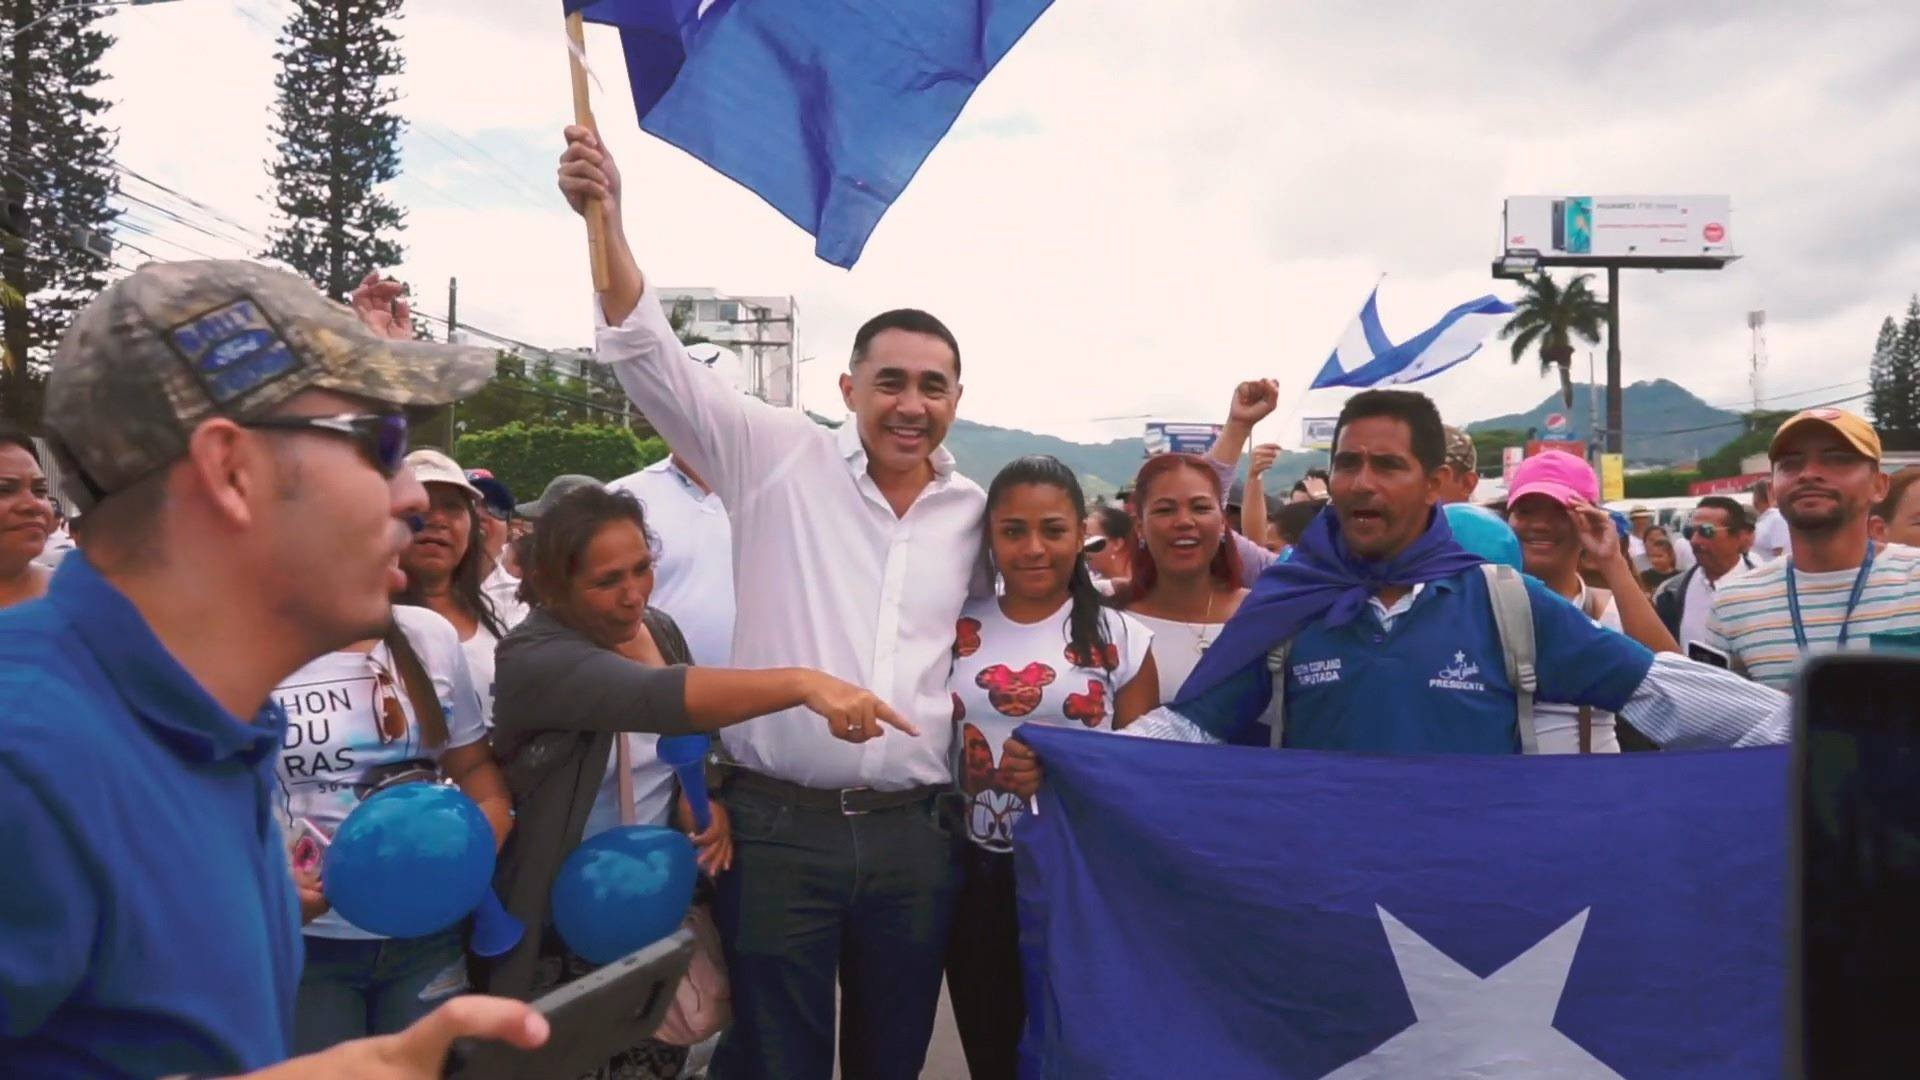 Marcha de apoyo a JOH agosto 10 - Mario Pineda